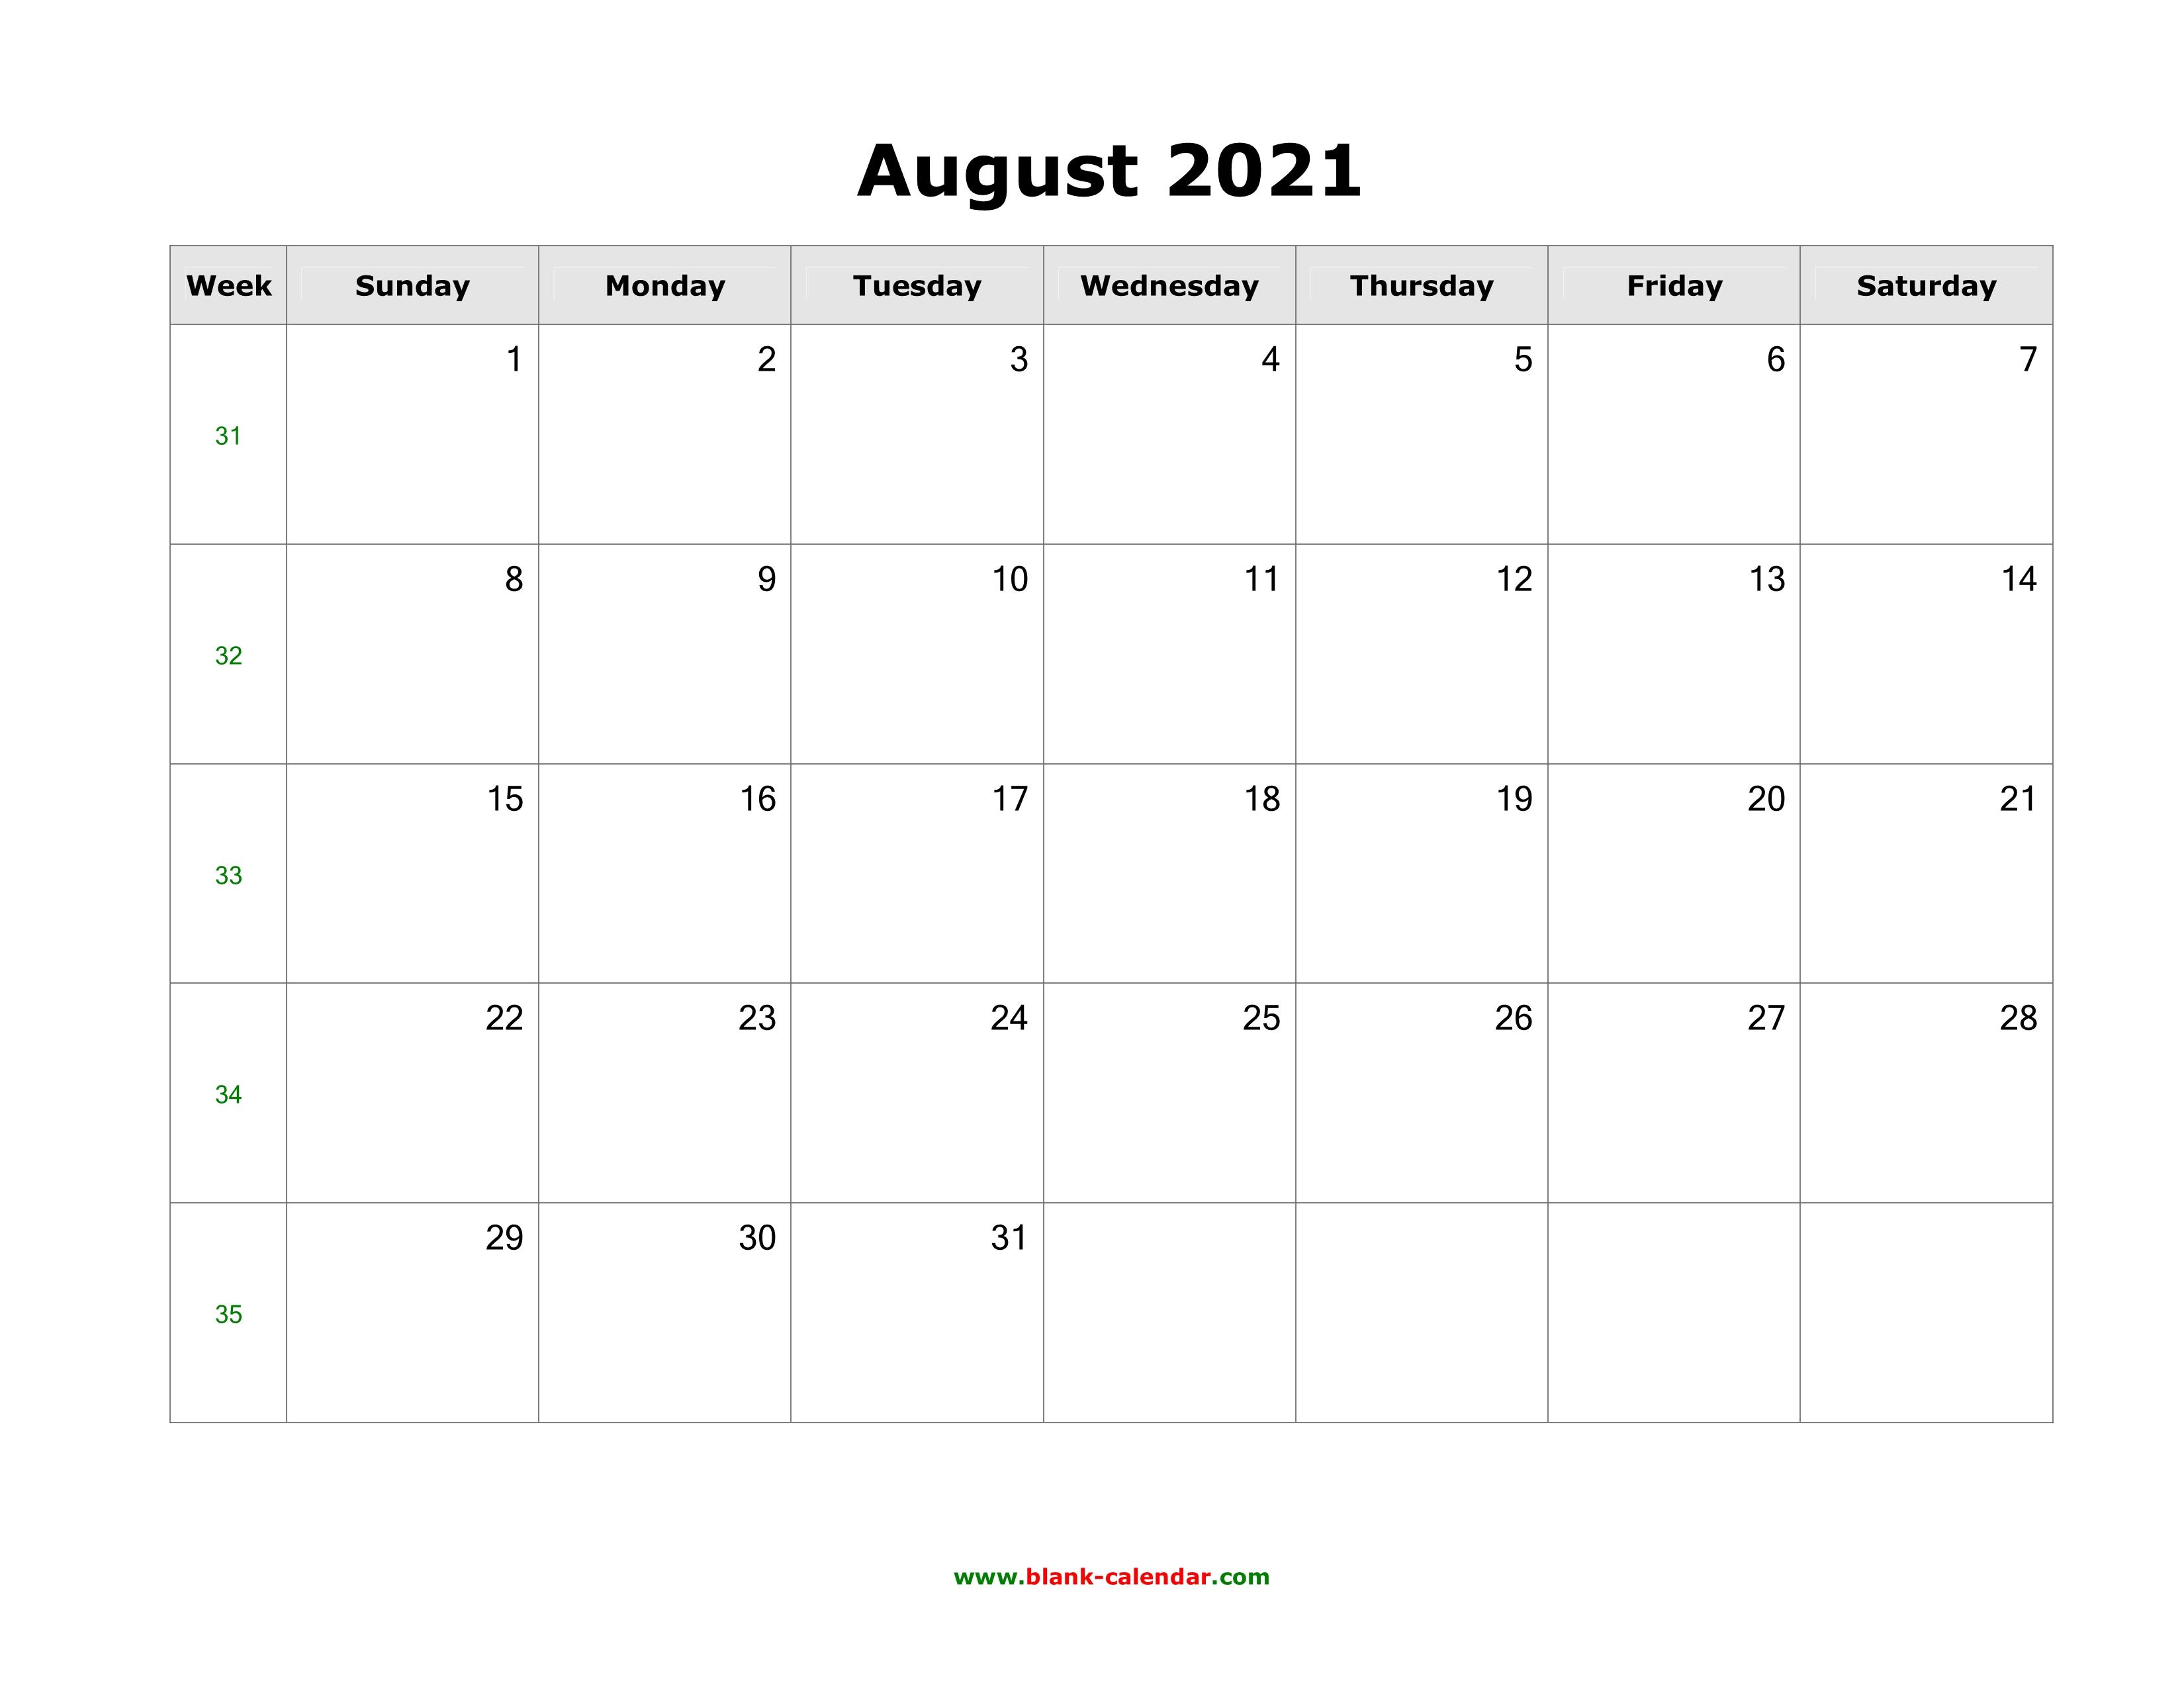 Download August 2021 Blank Calendar (horizontal)